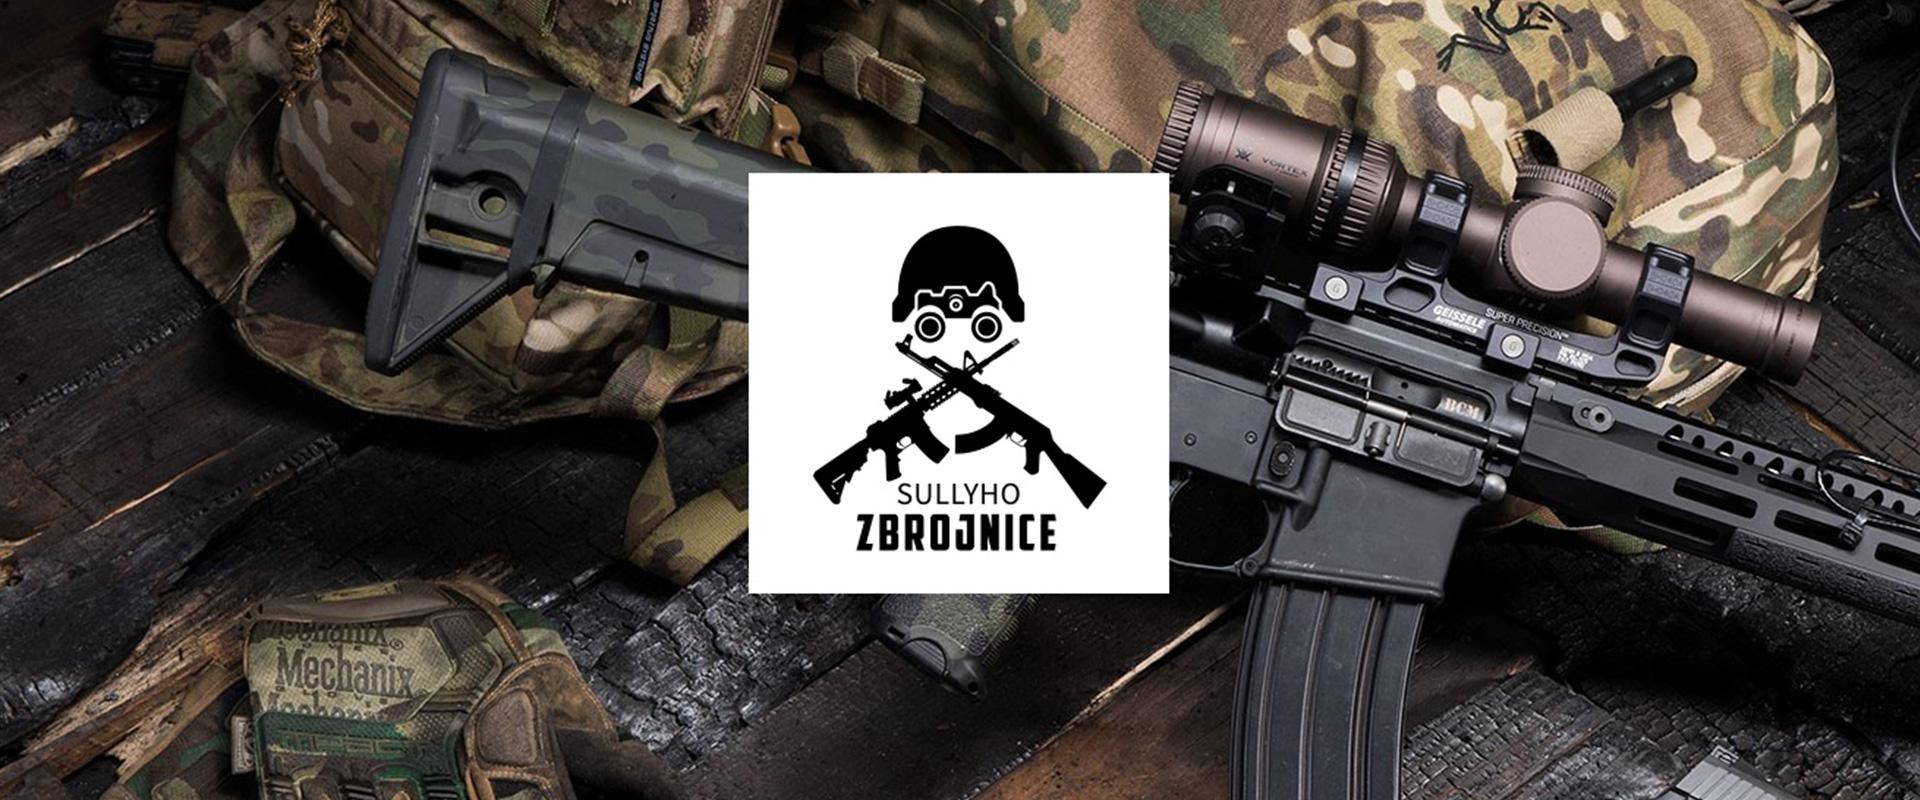 Sullyho Zbrojnice title